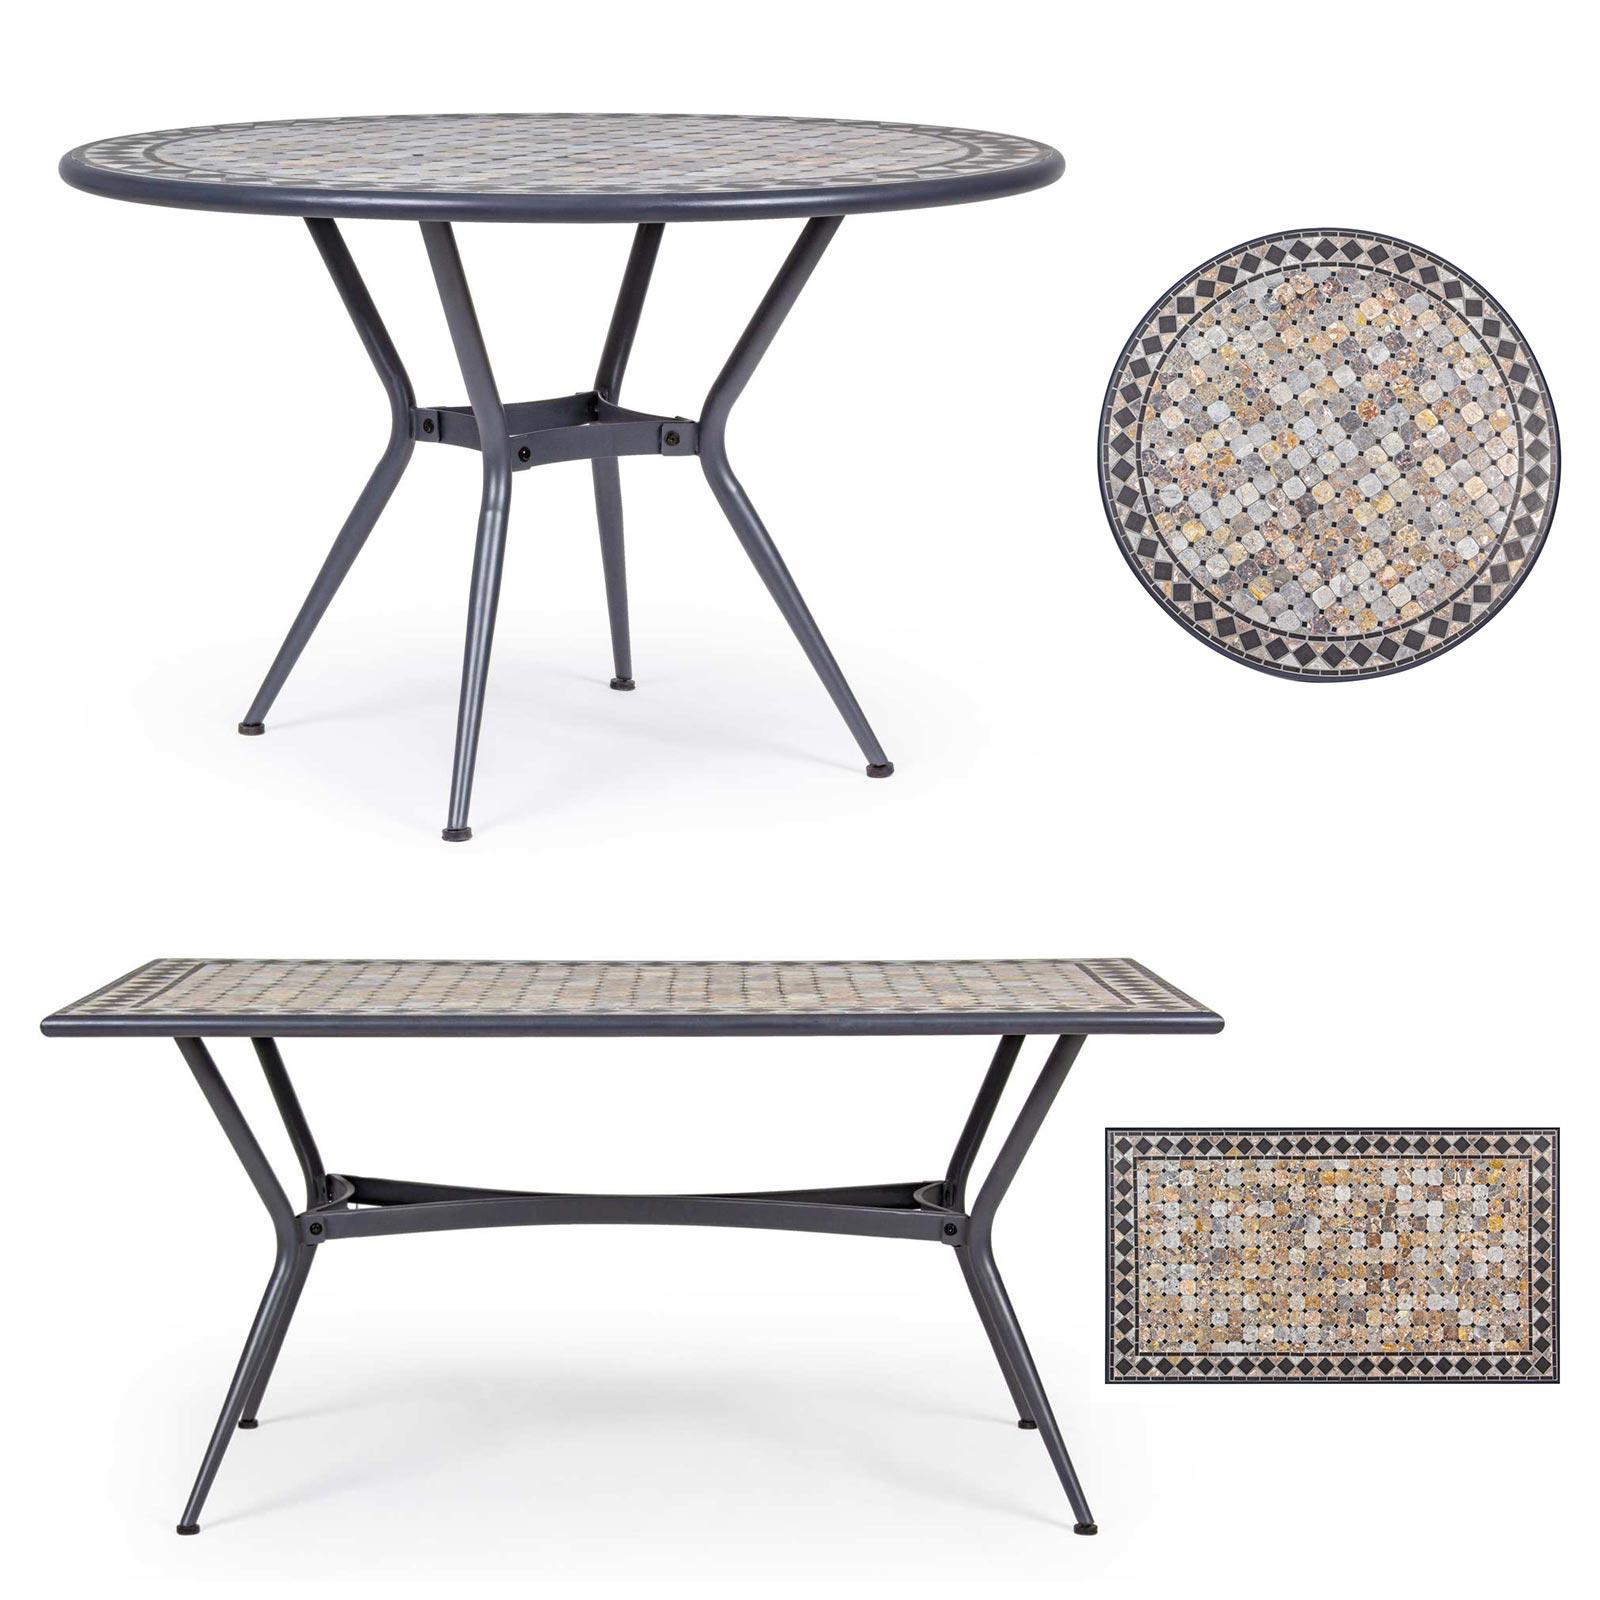 Tavolo Esterno Giardino Decoro Ceramica Mosaico Acciaio Pranzo Rotondo Berkley Ebay